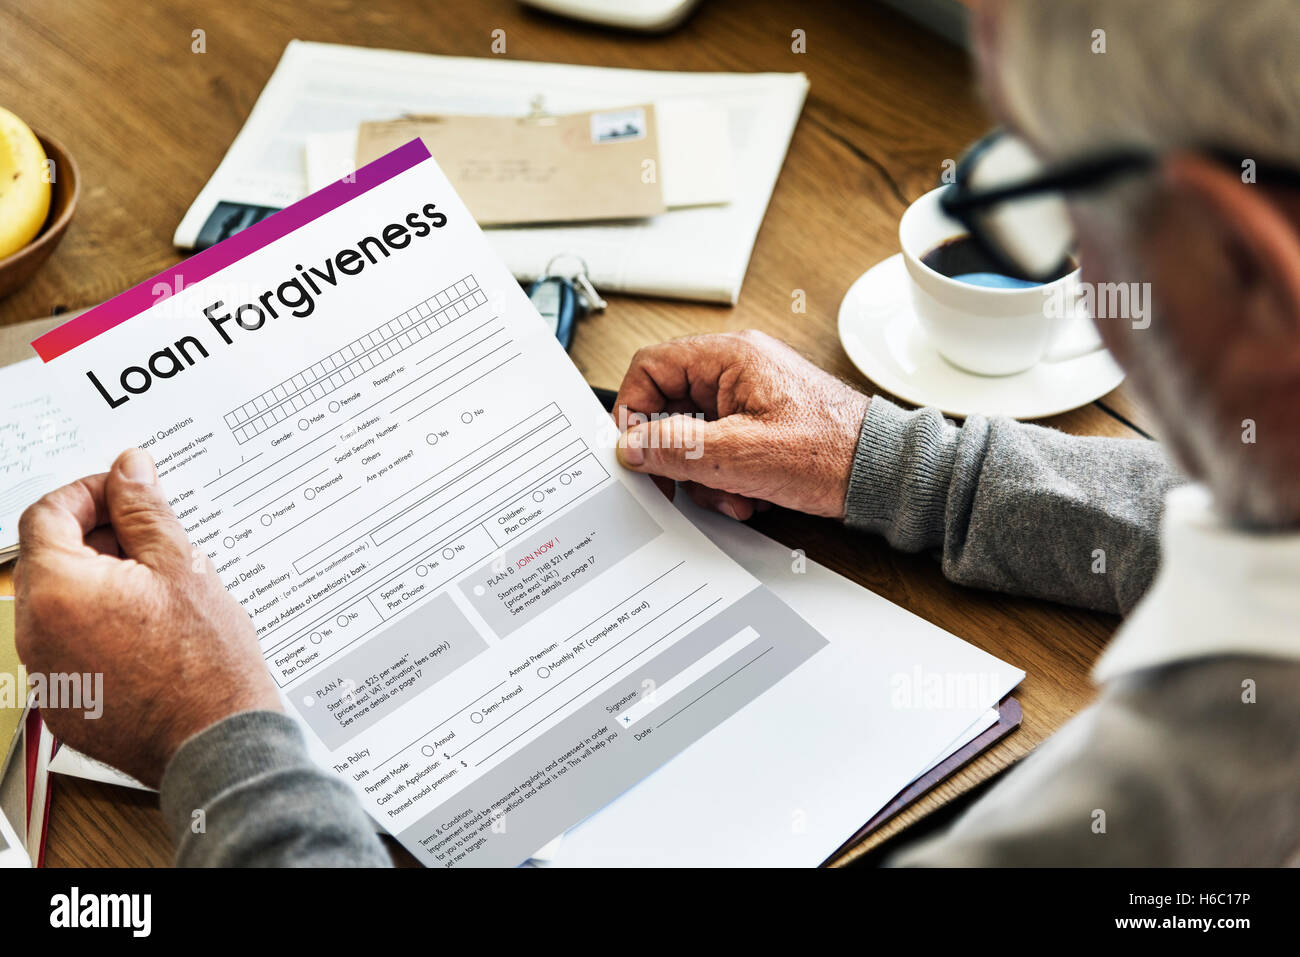 Loan Forgiveness Debt Filling Application Concept - Stock Image